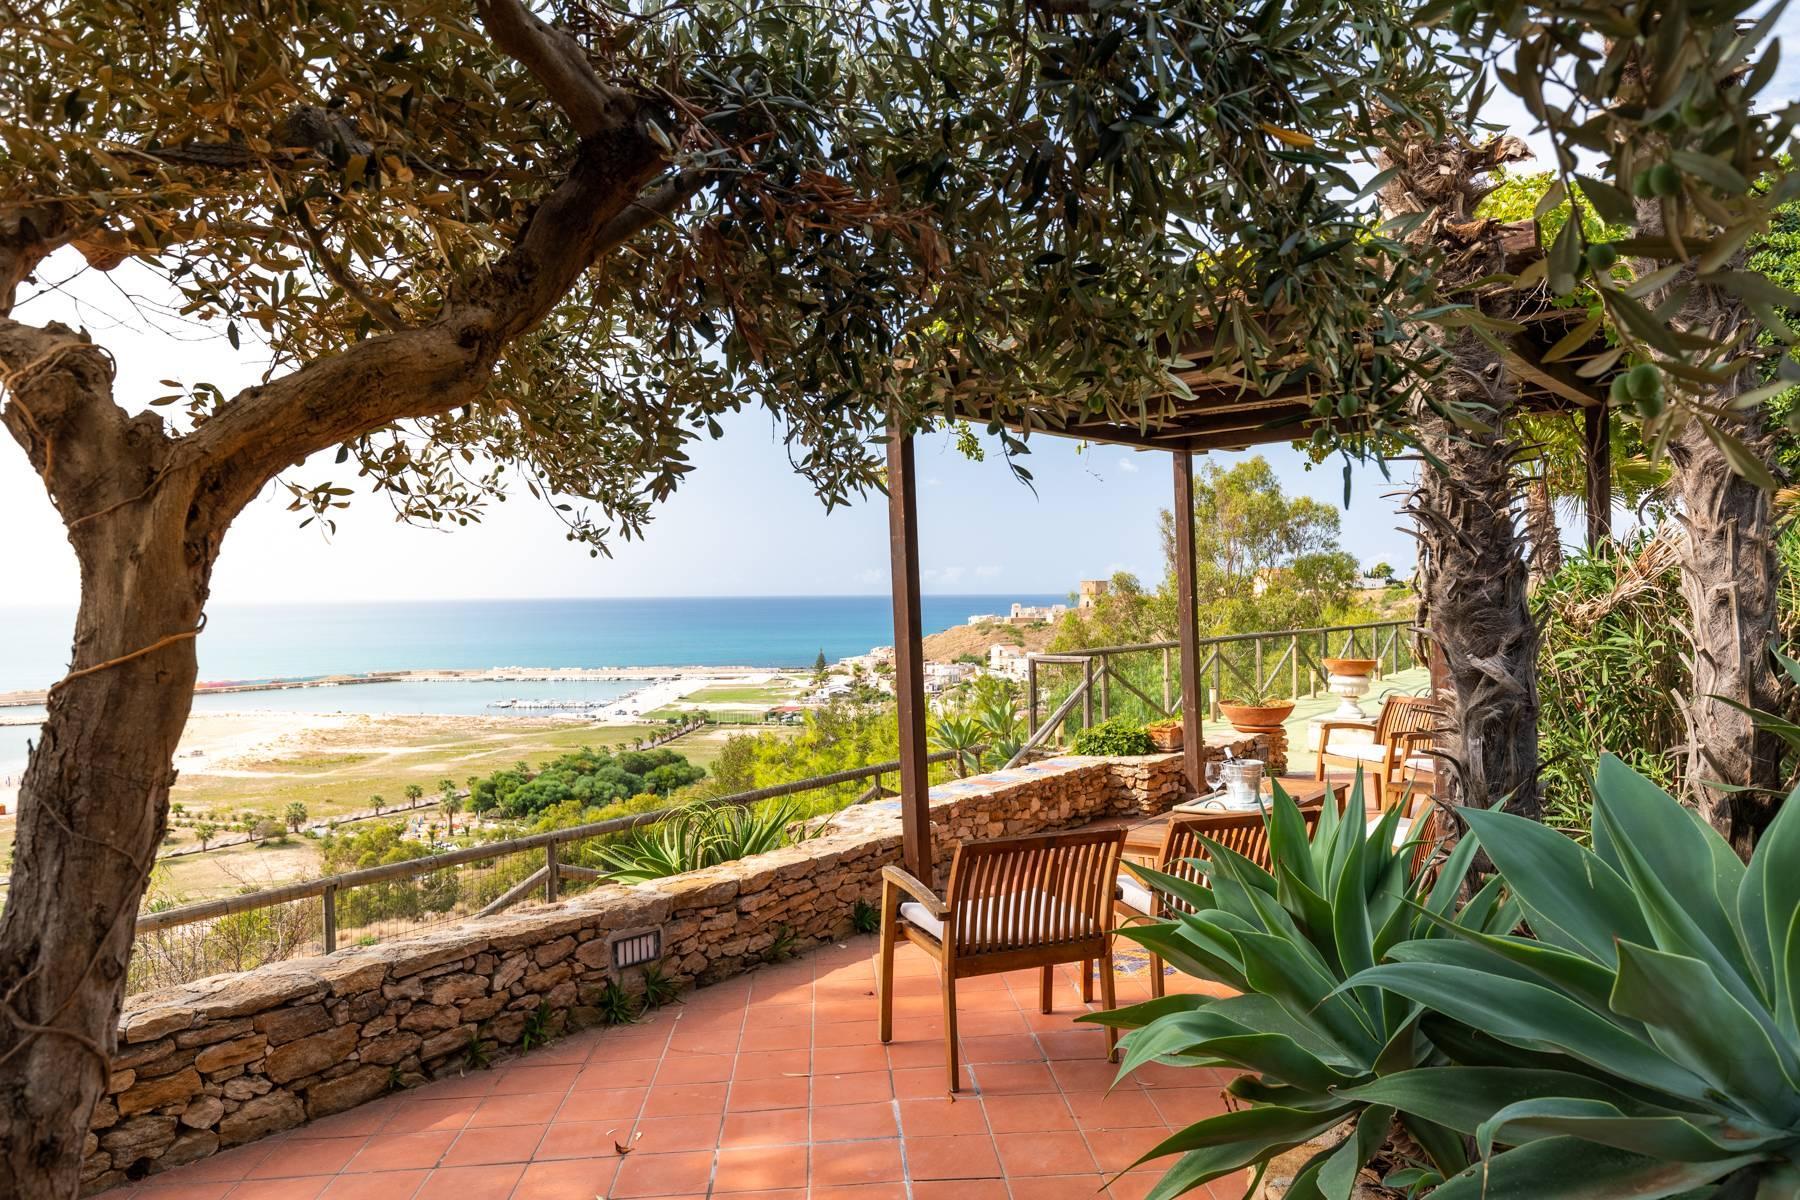 Sizilianische Villa am Mittel Meer - 6